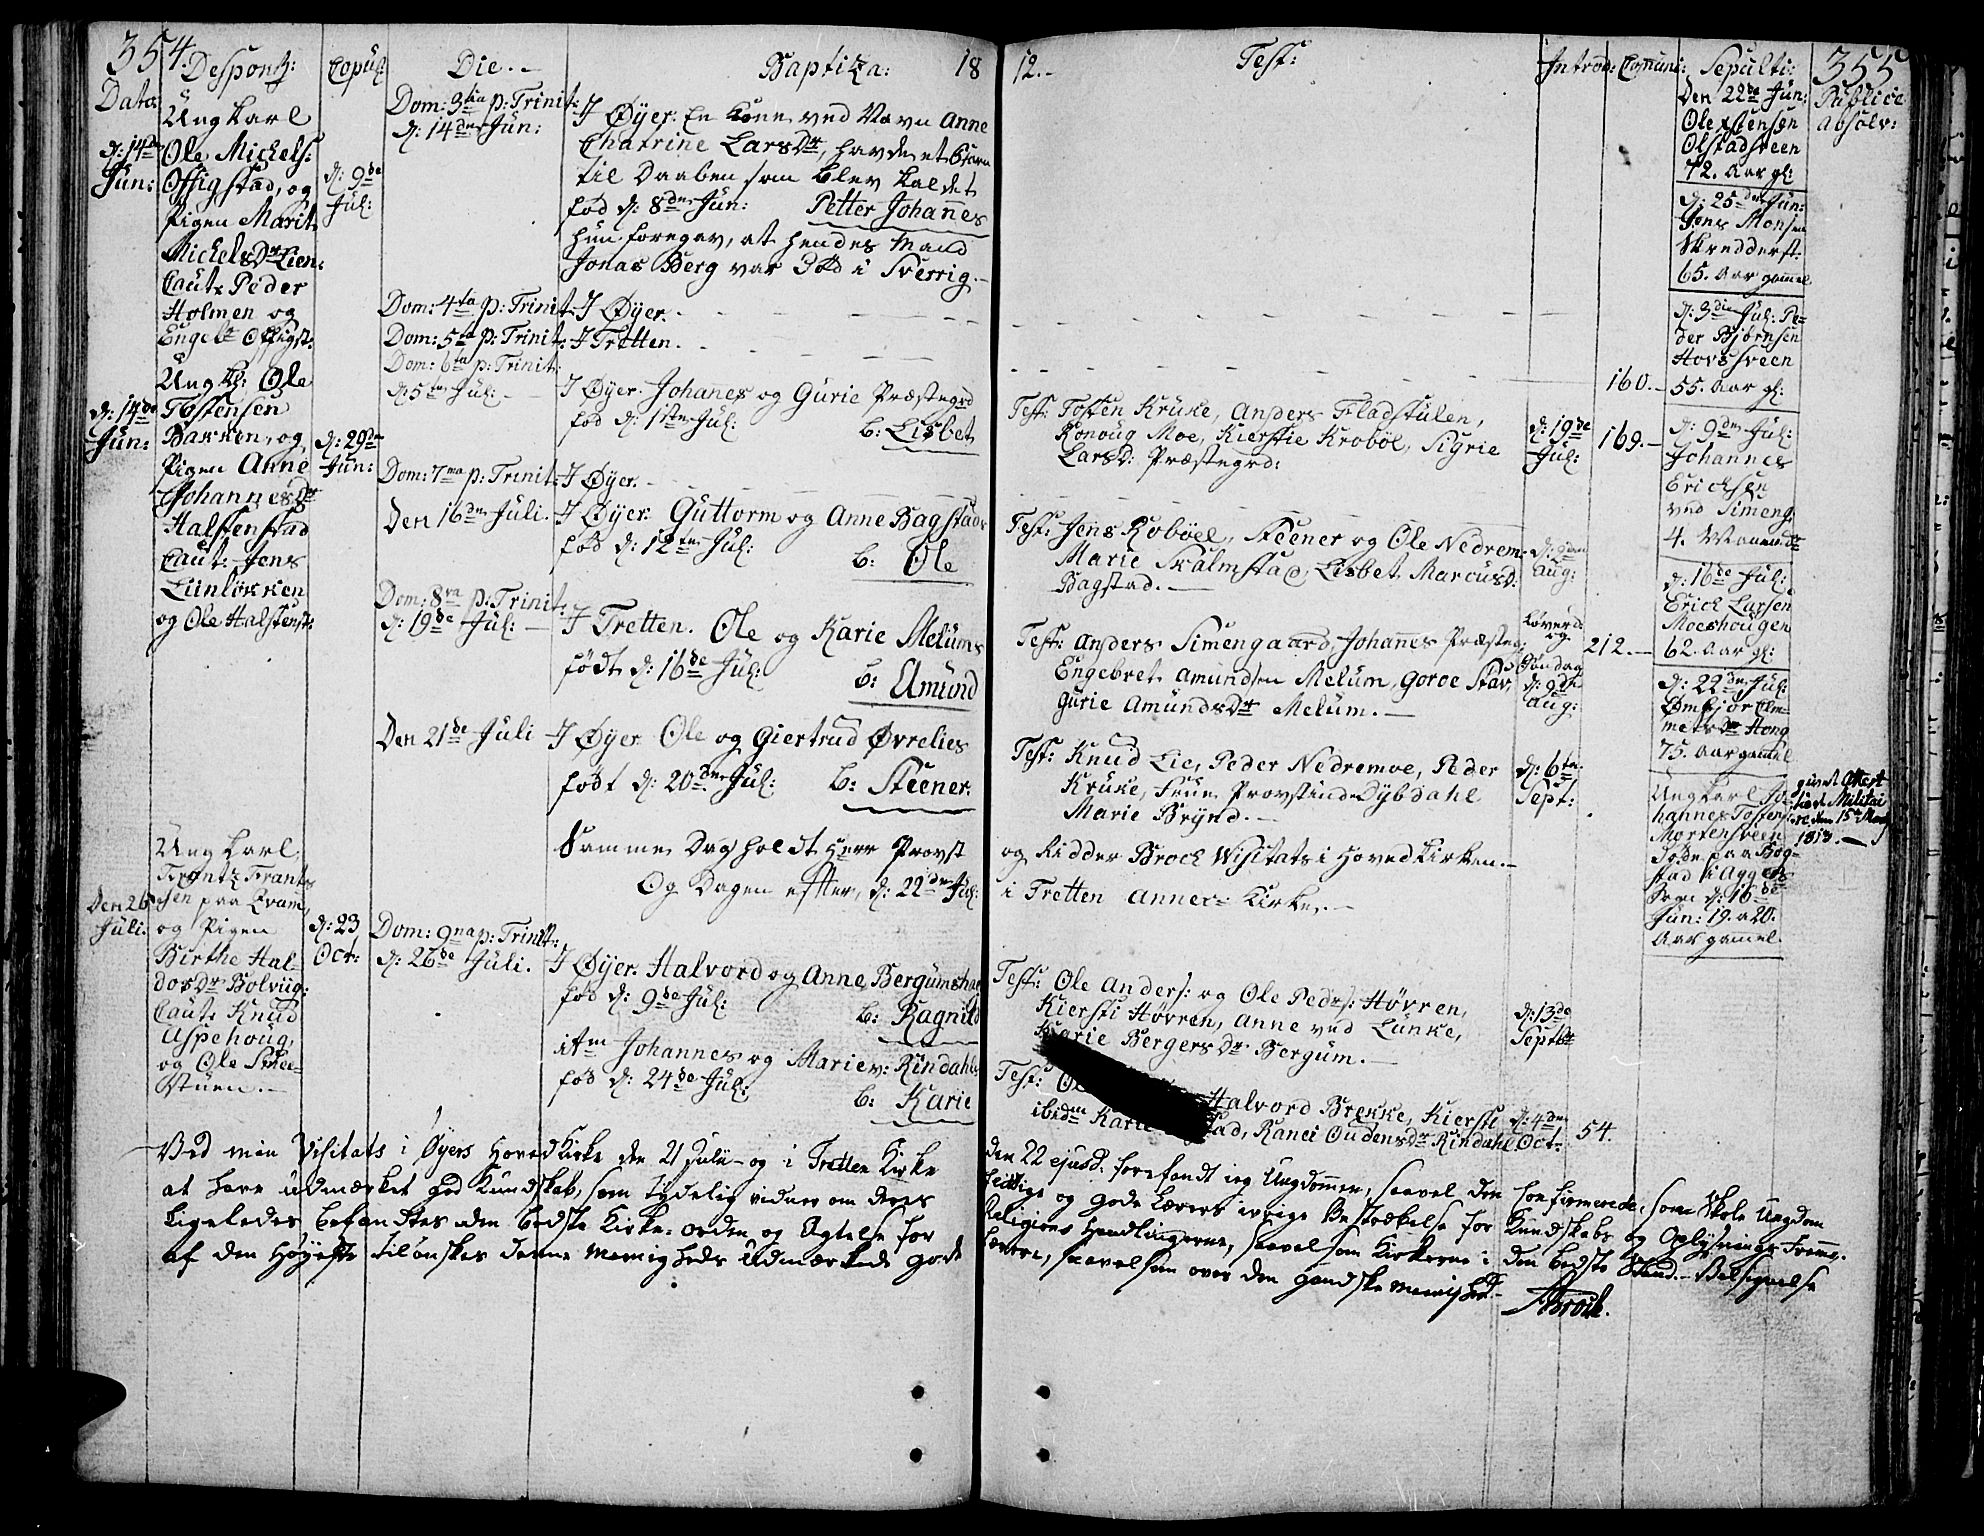 SAH, Øyer prestekontor, Ministerialbok nr. 3, 1784-1824, s. 354-355